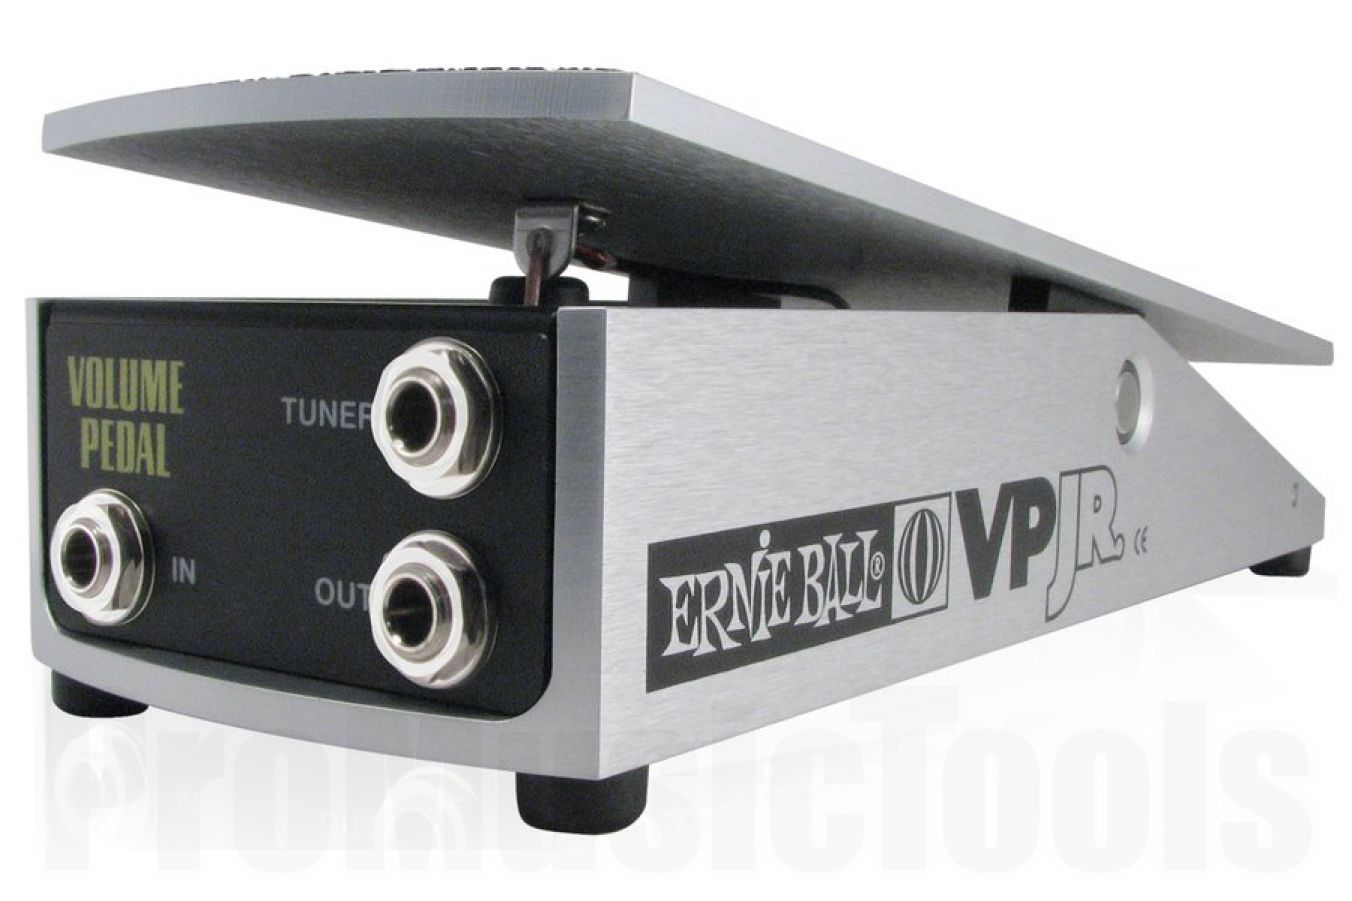 Ernie Ball USA EB6180 VP-JR Volume Pedal